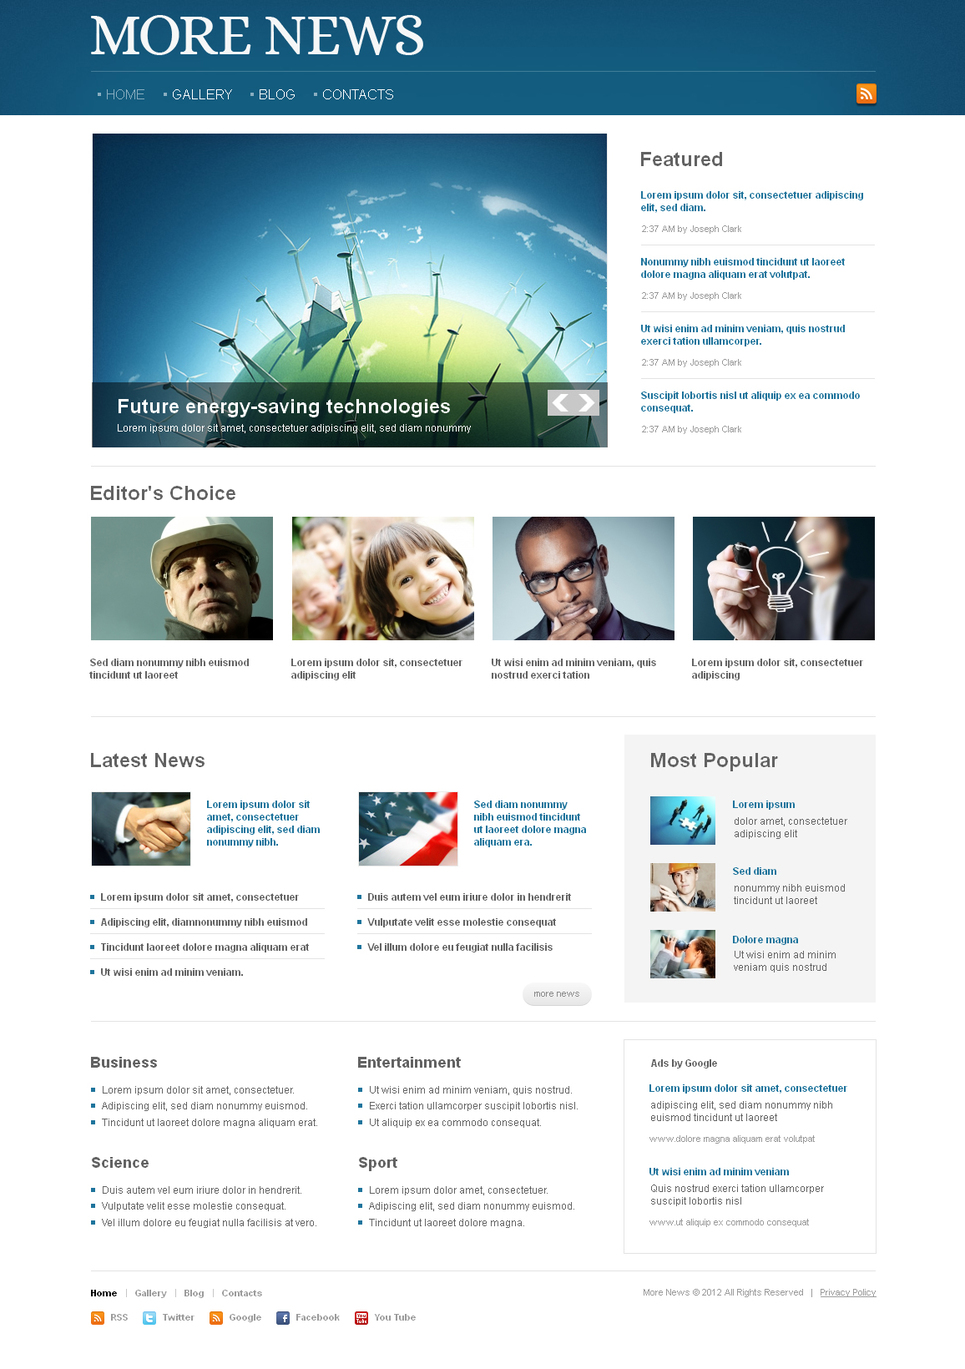 MotoCMS HTML Шаблон #41456 из категории Медиа - image